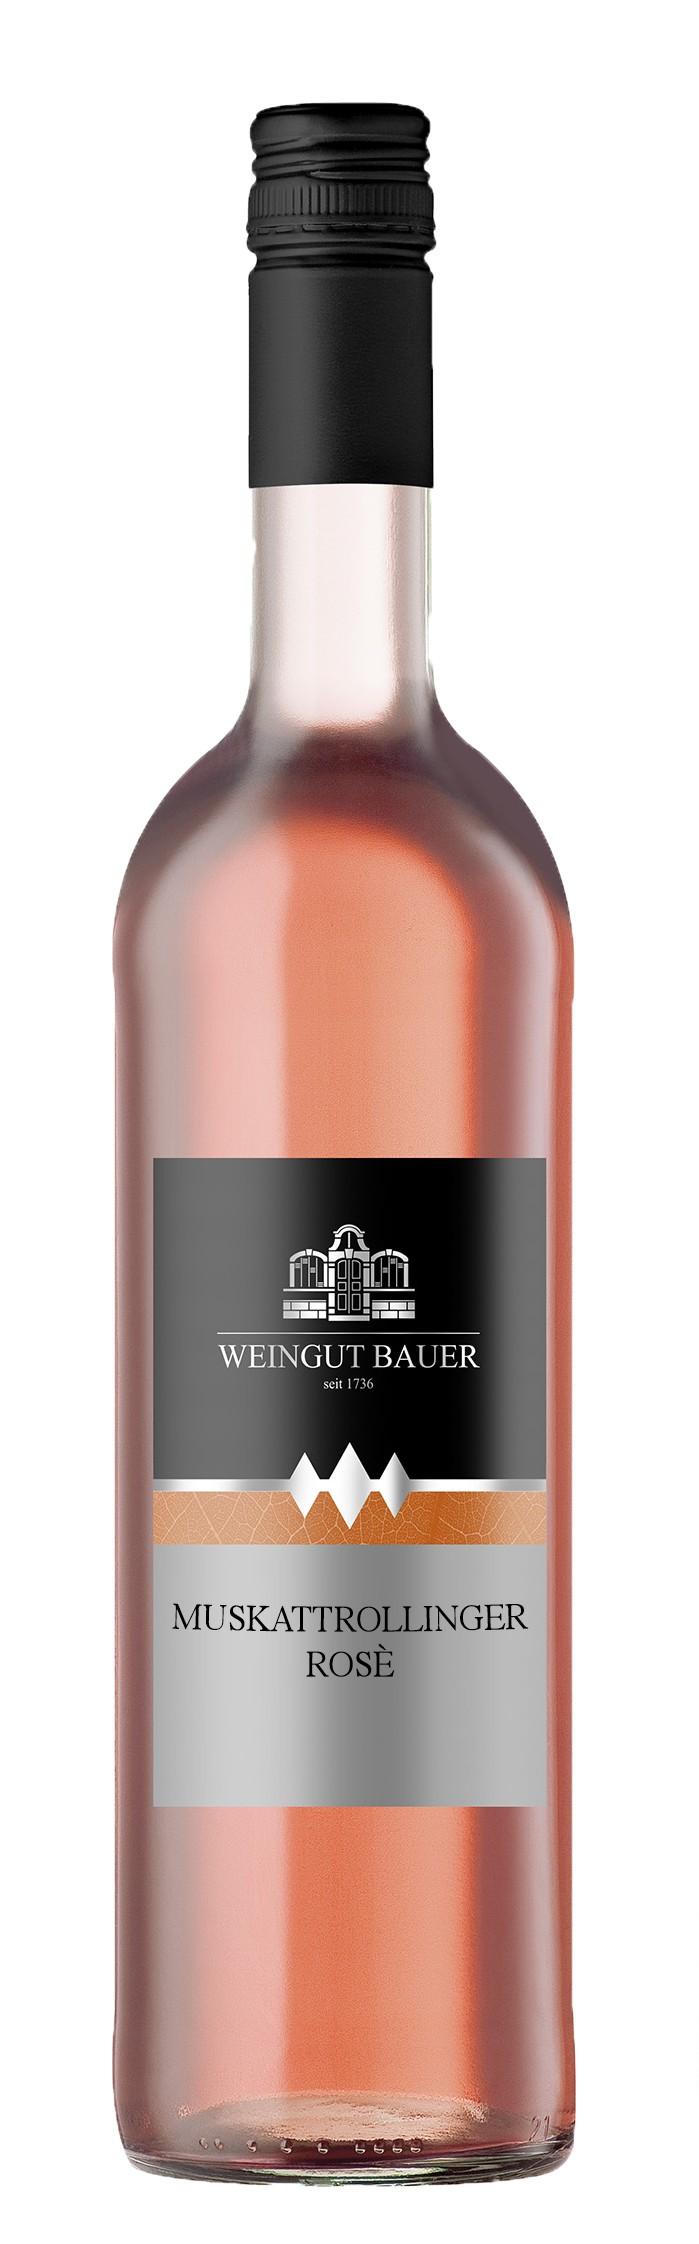 2016 Muskattrollinger Rosé, 750ml